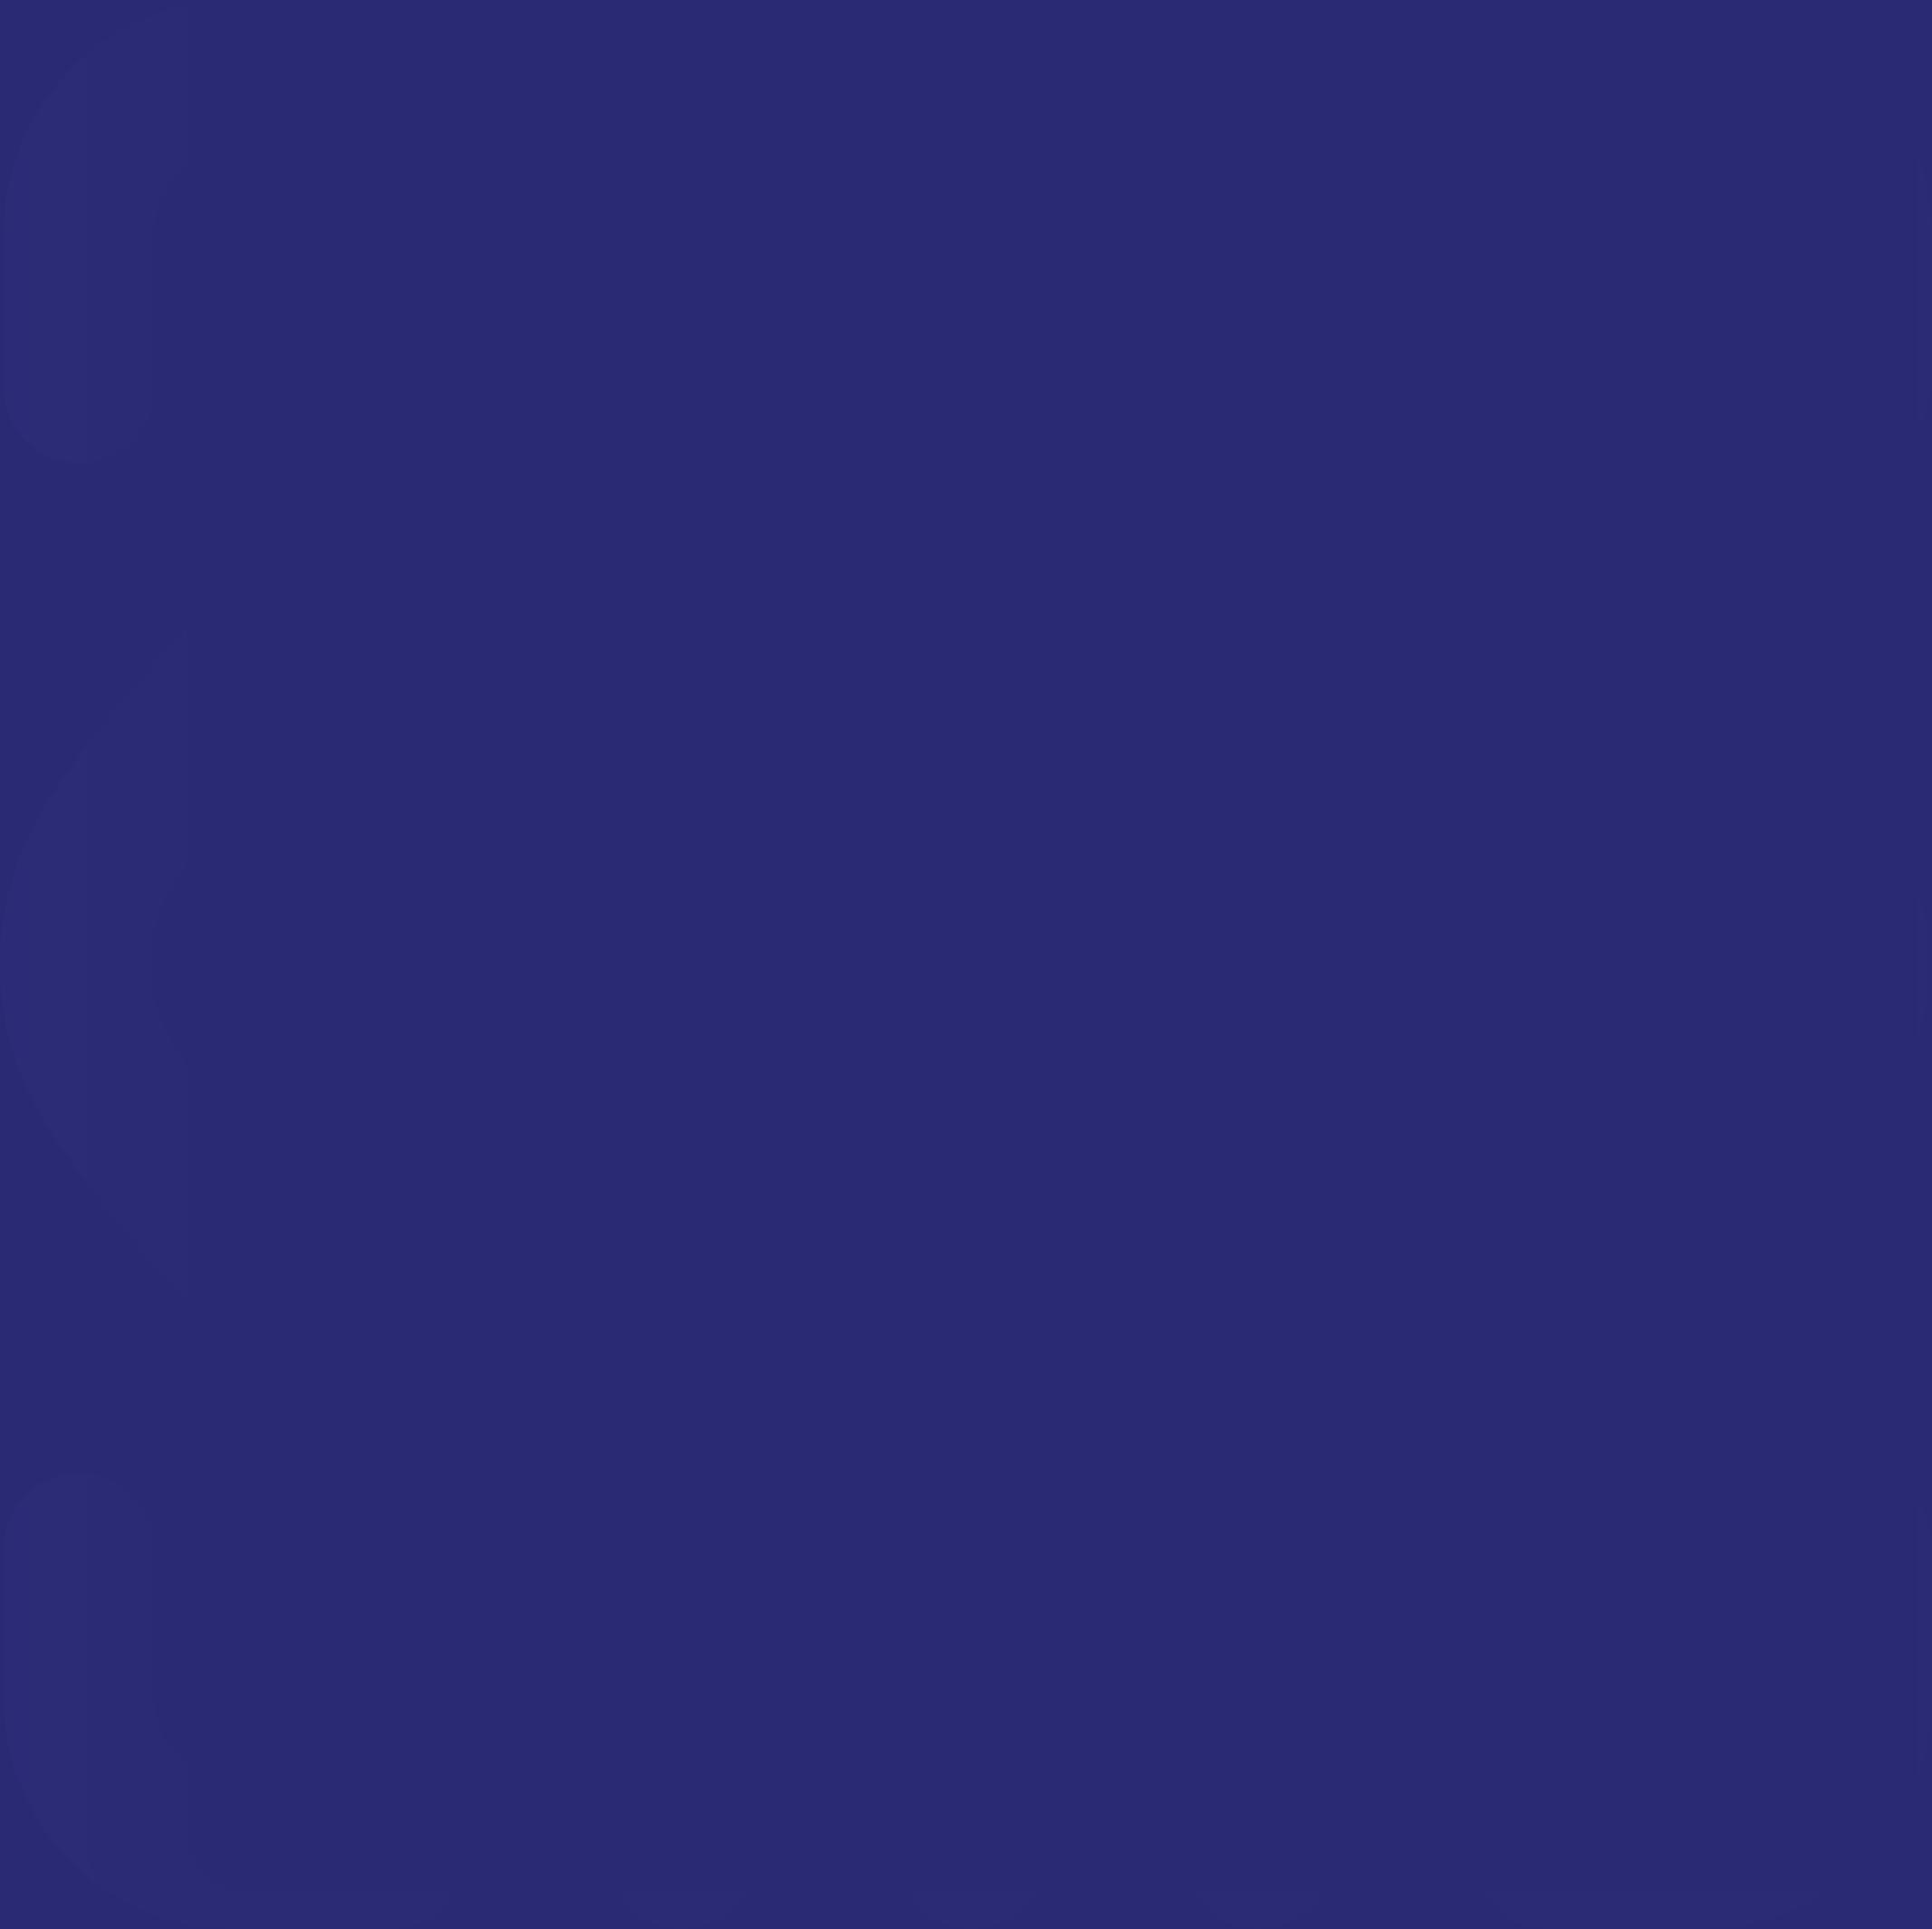 icone en forme d'oeil